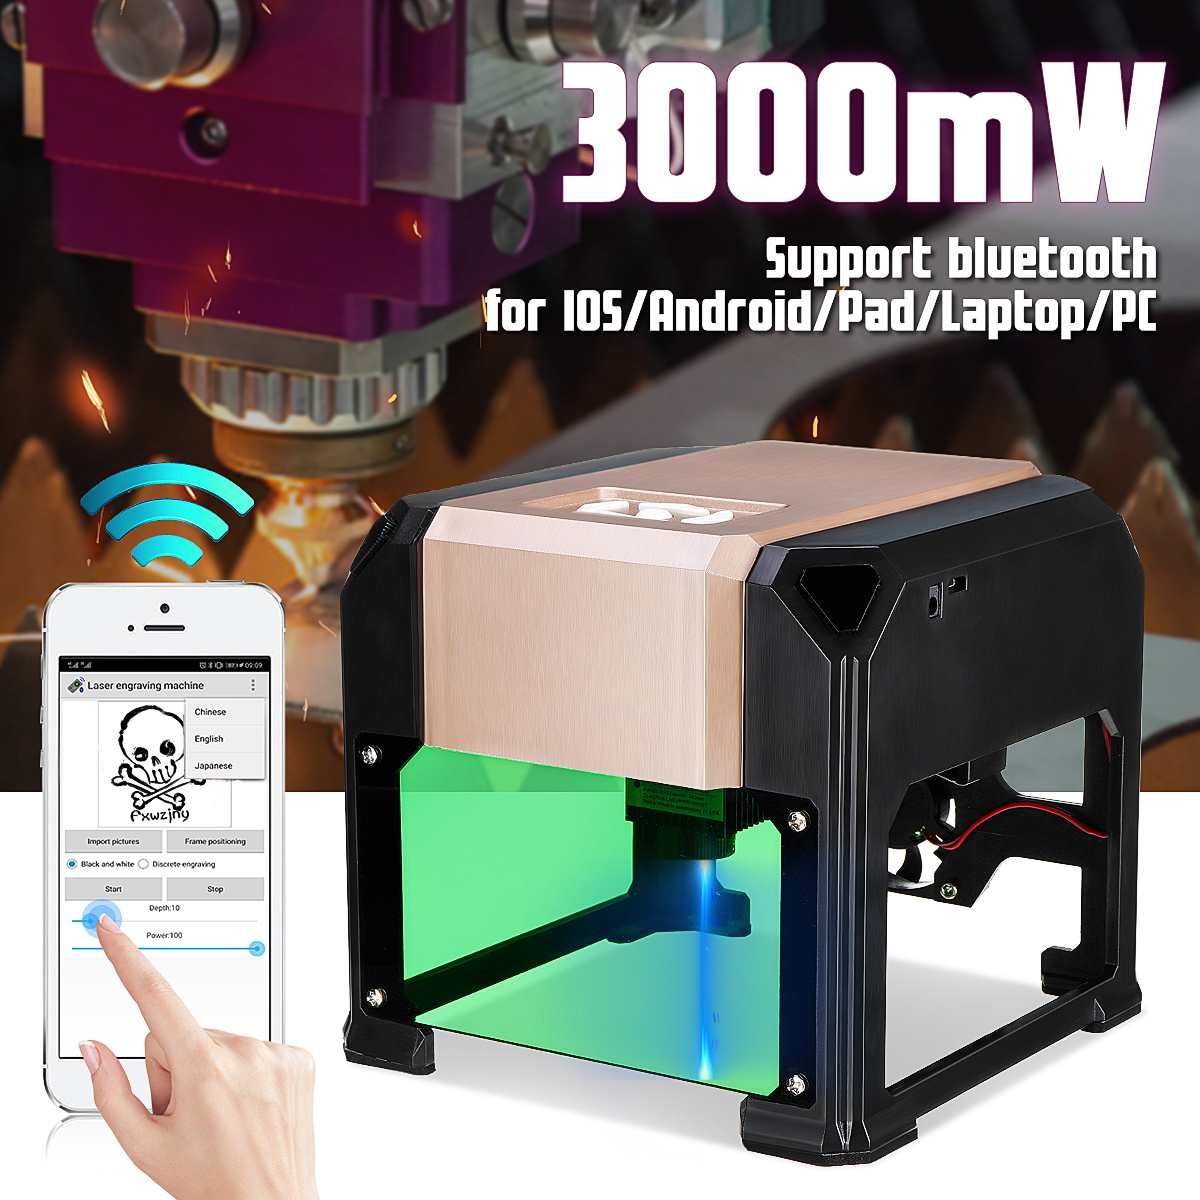 bluetooth Control 3000mW Professional DIY Desktop Mini CNC Laser Engraver Cutter Engraving Wood Cutting Machine Router 110-220V